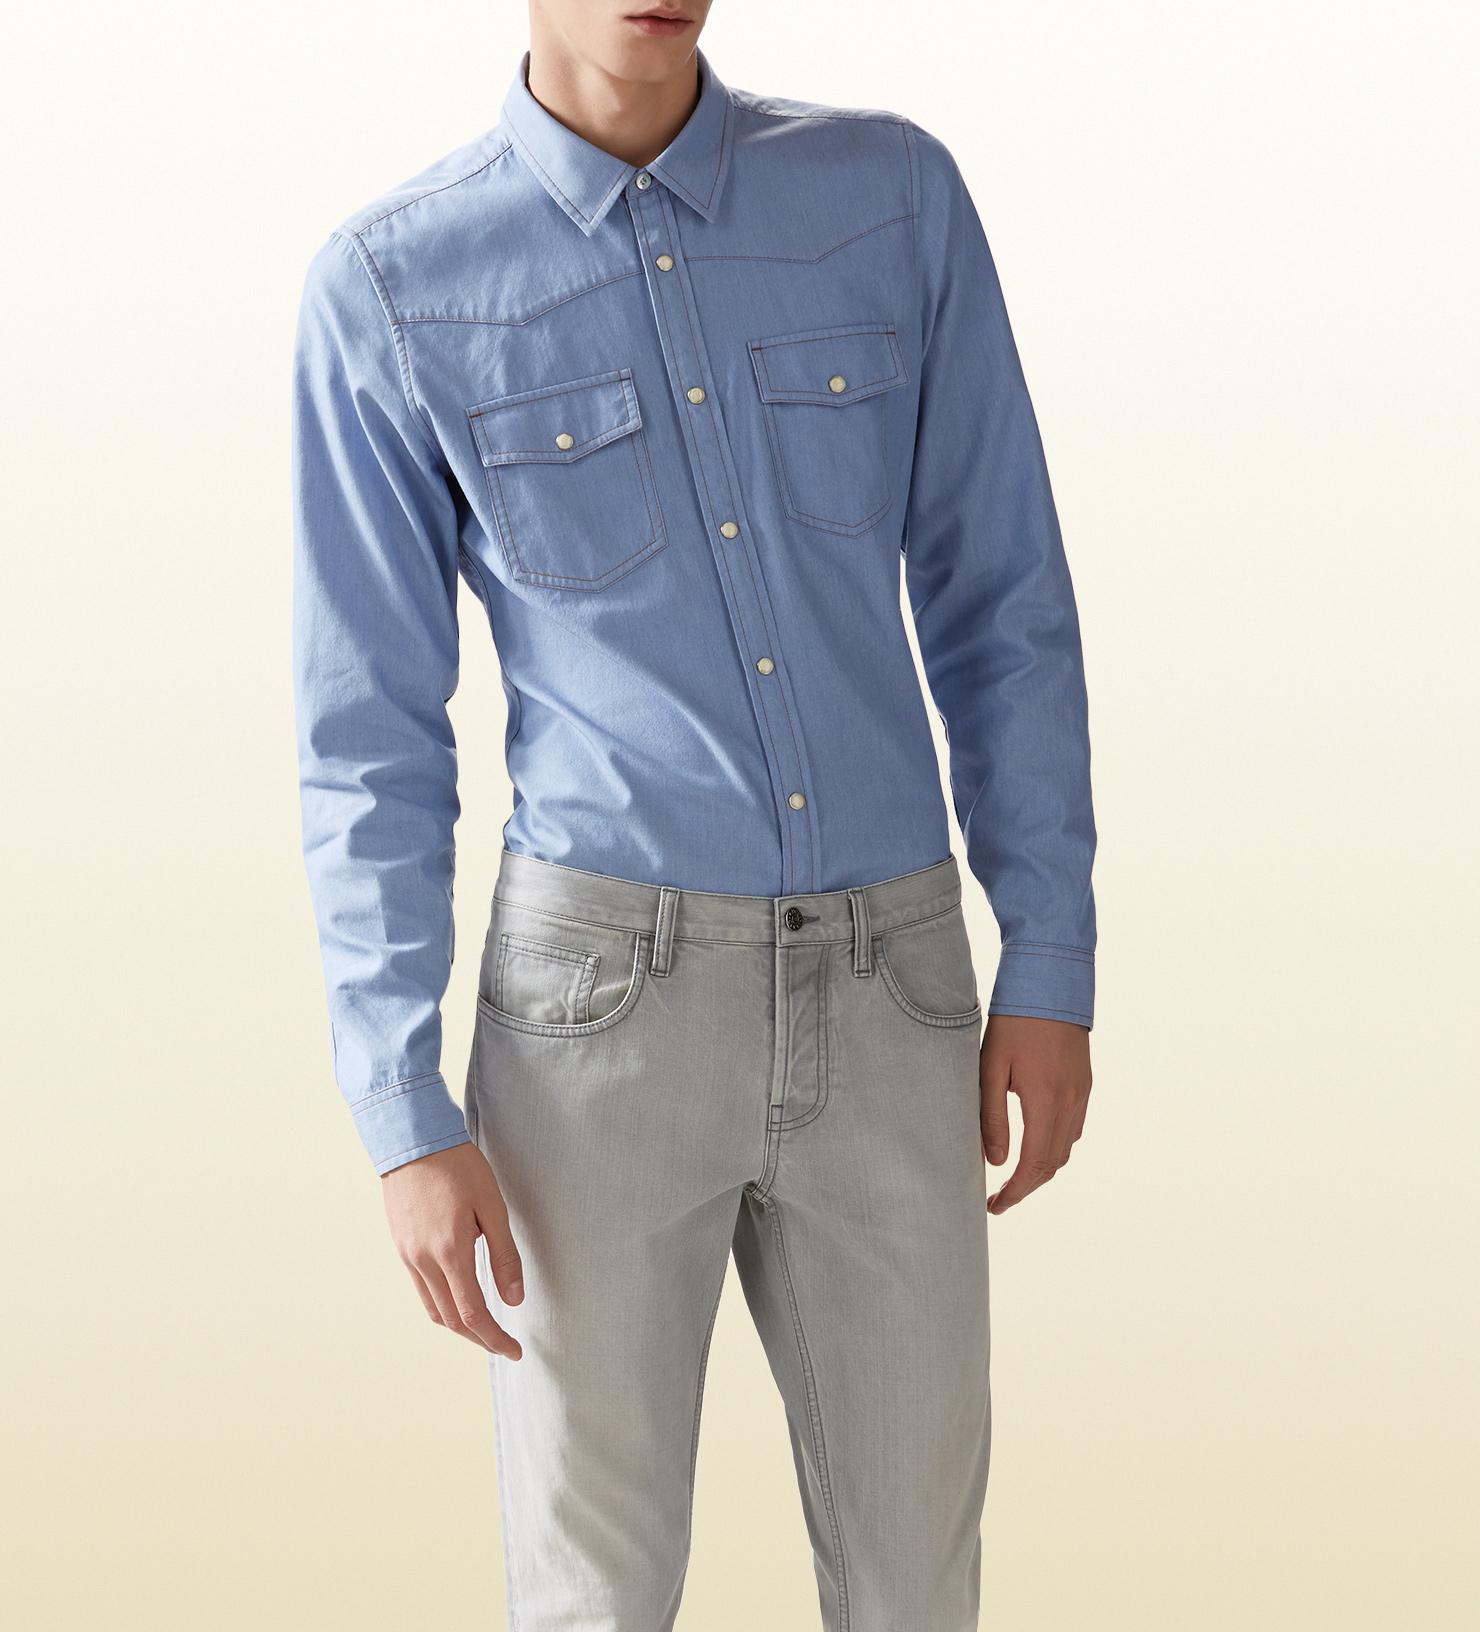 Gucci Light Blue Denim Chambray Shirt In Blue For Men Lyst